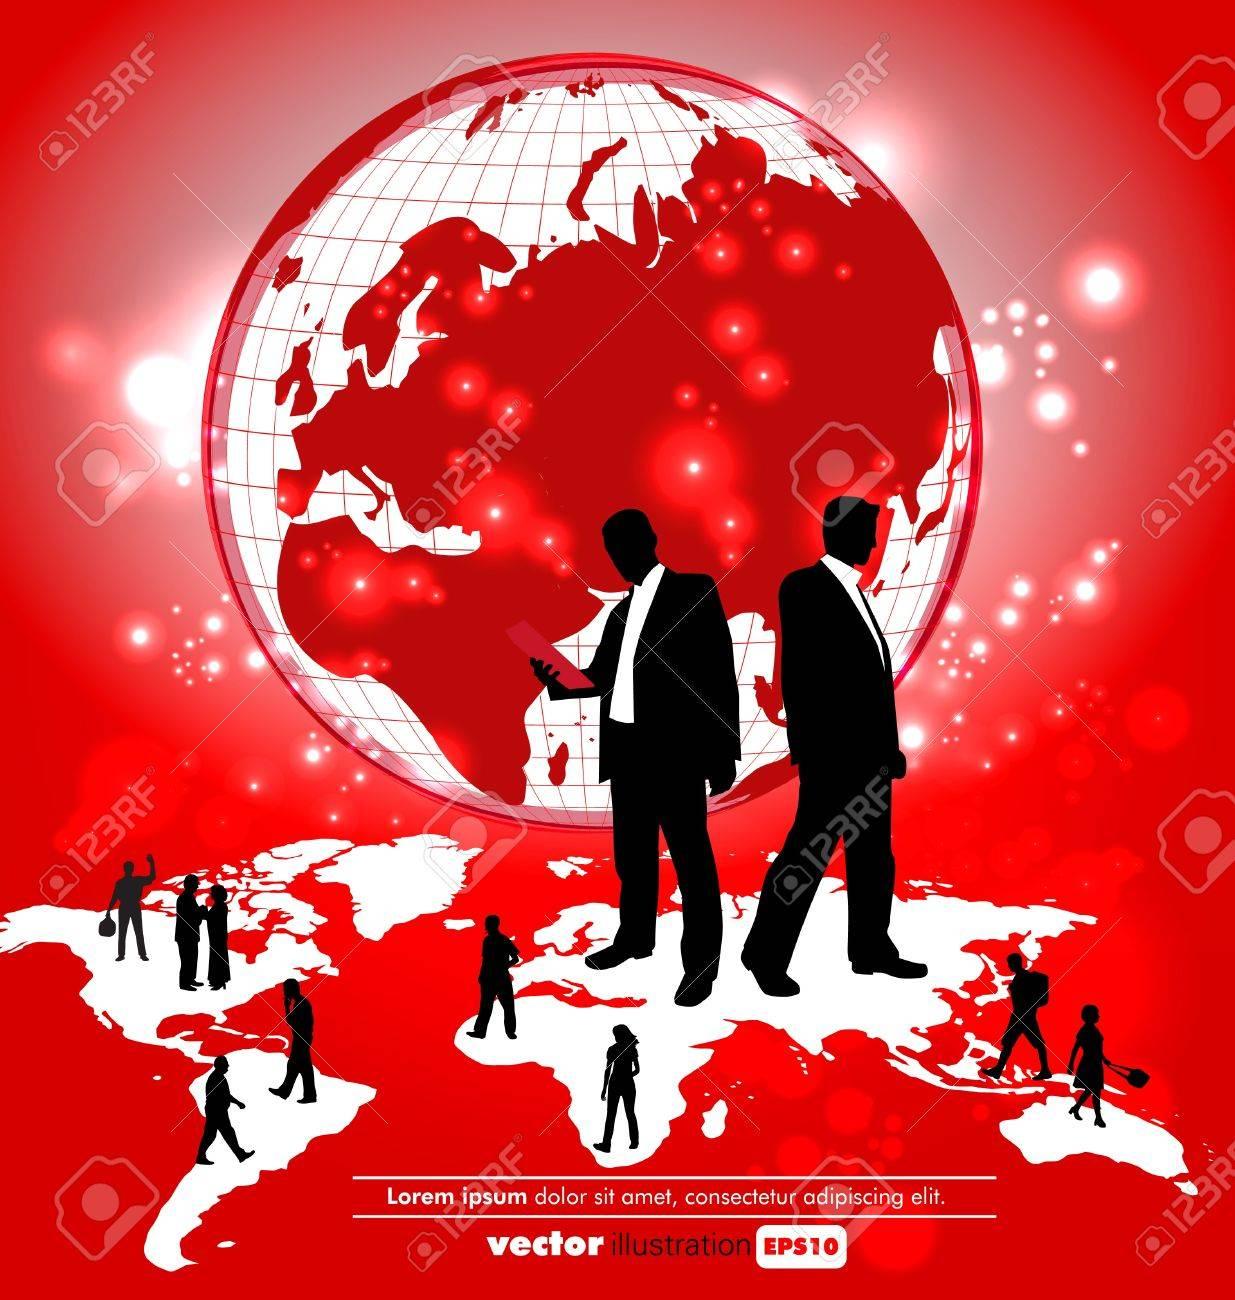 World organization Stock Vector - 11280315